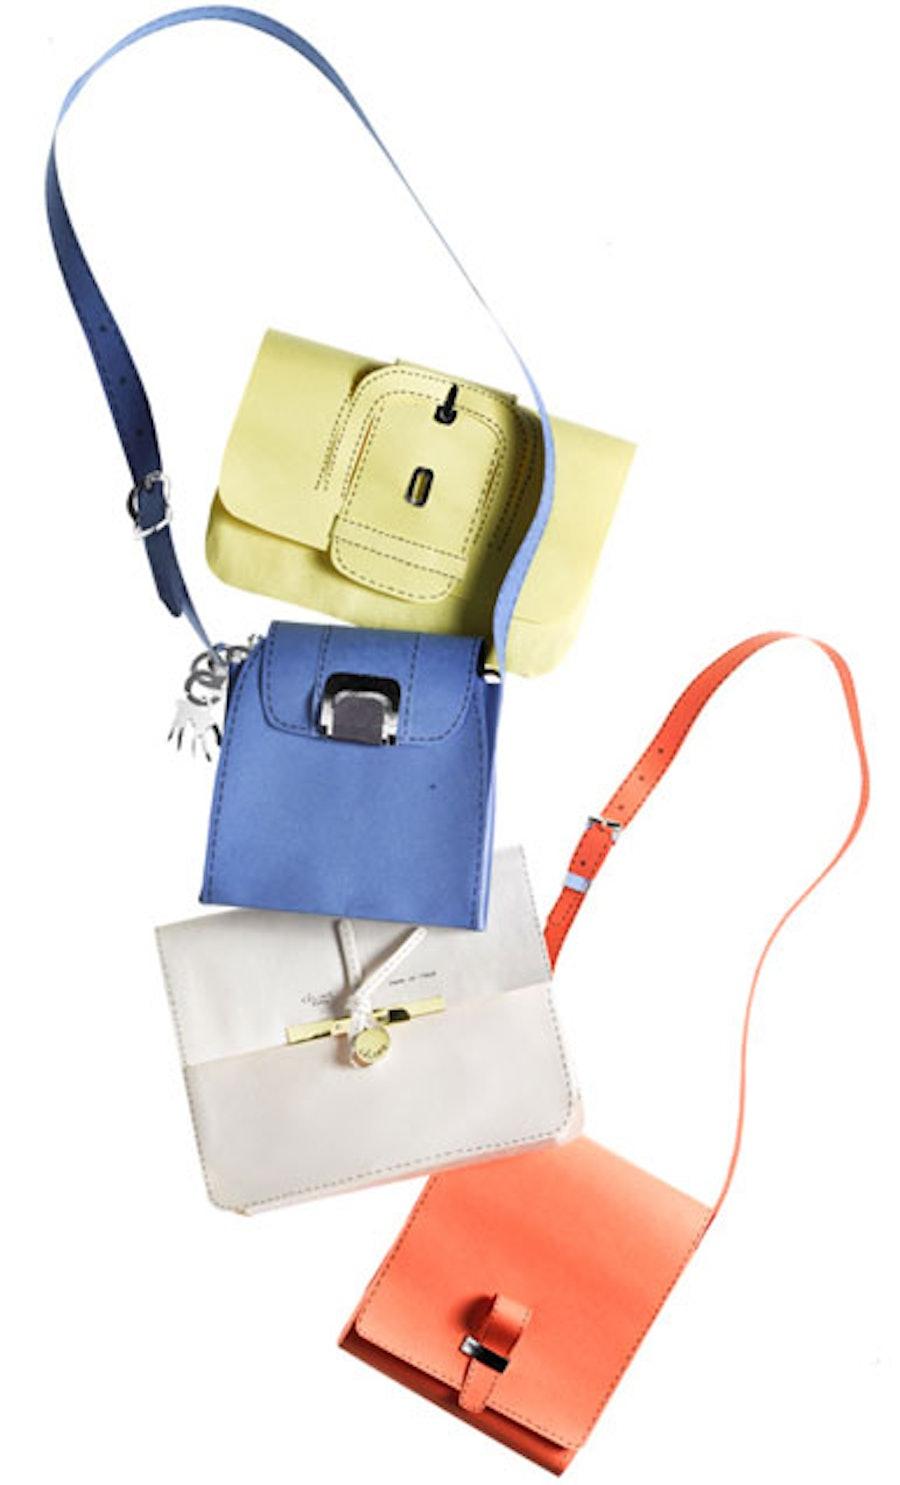 blog-elizabeth-spiridakis-paper-purses-01.jpg